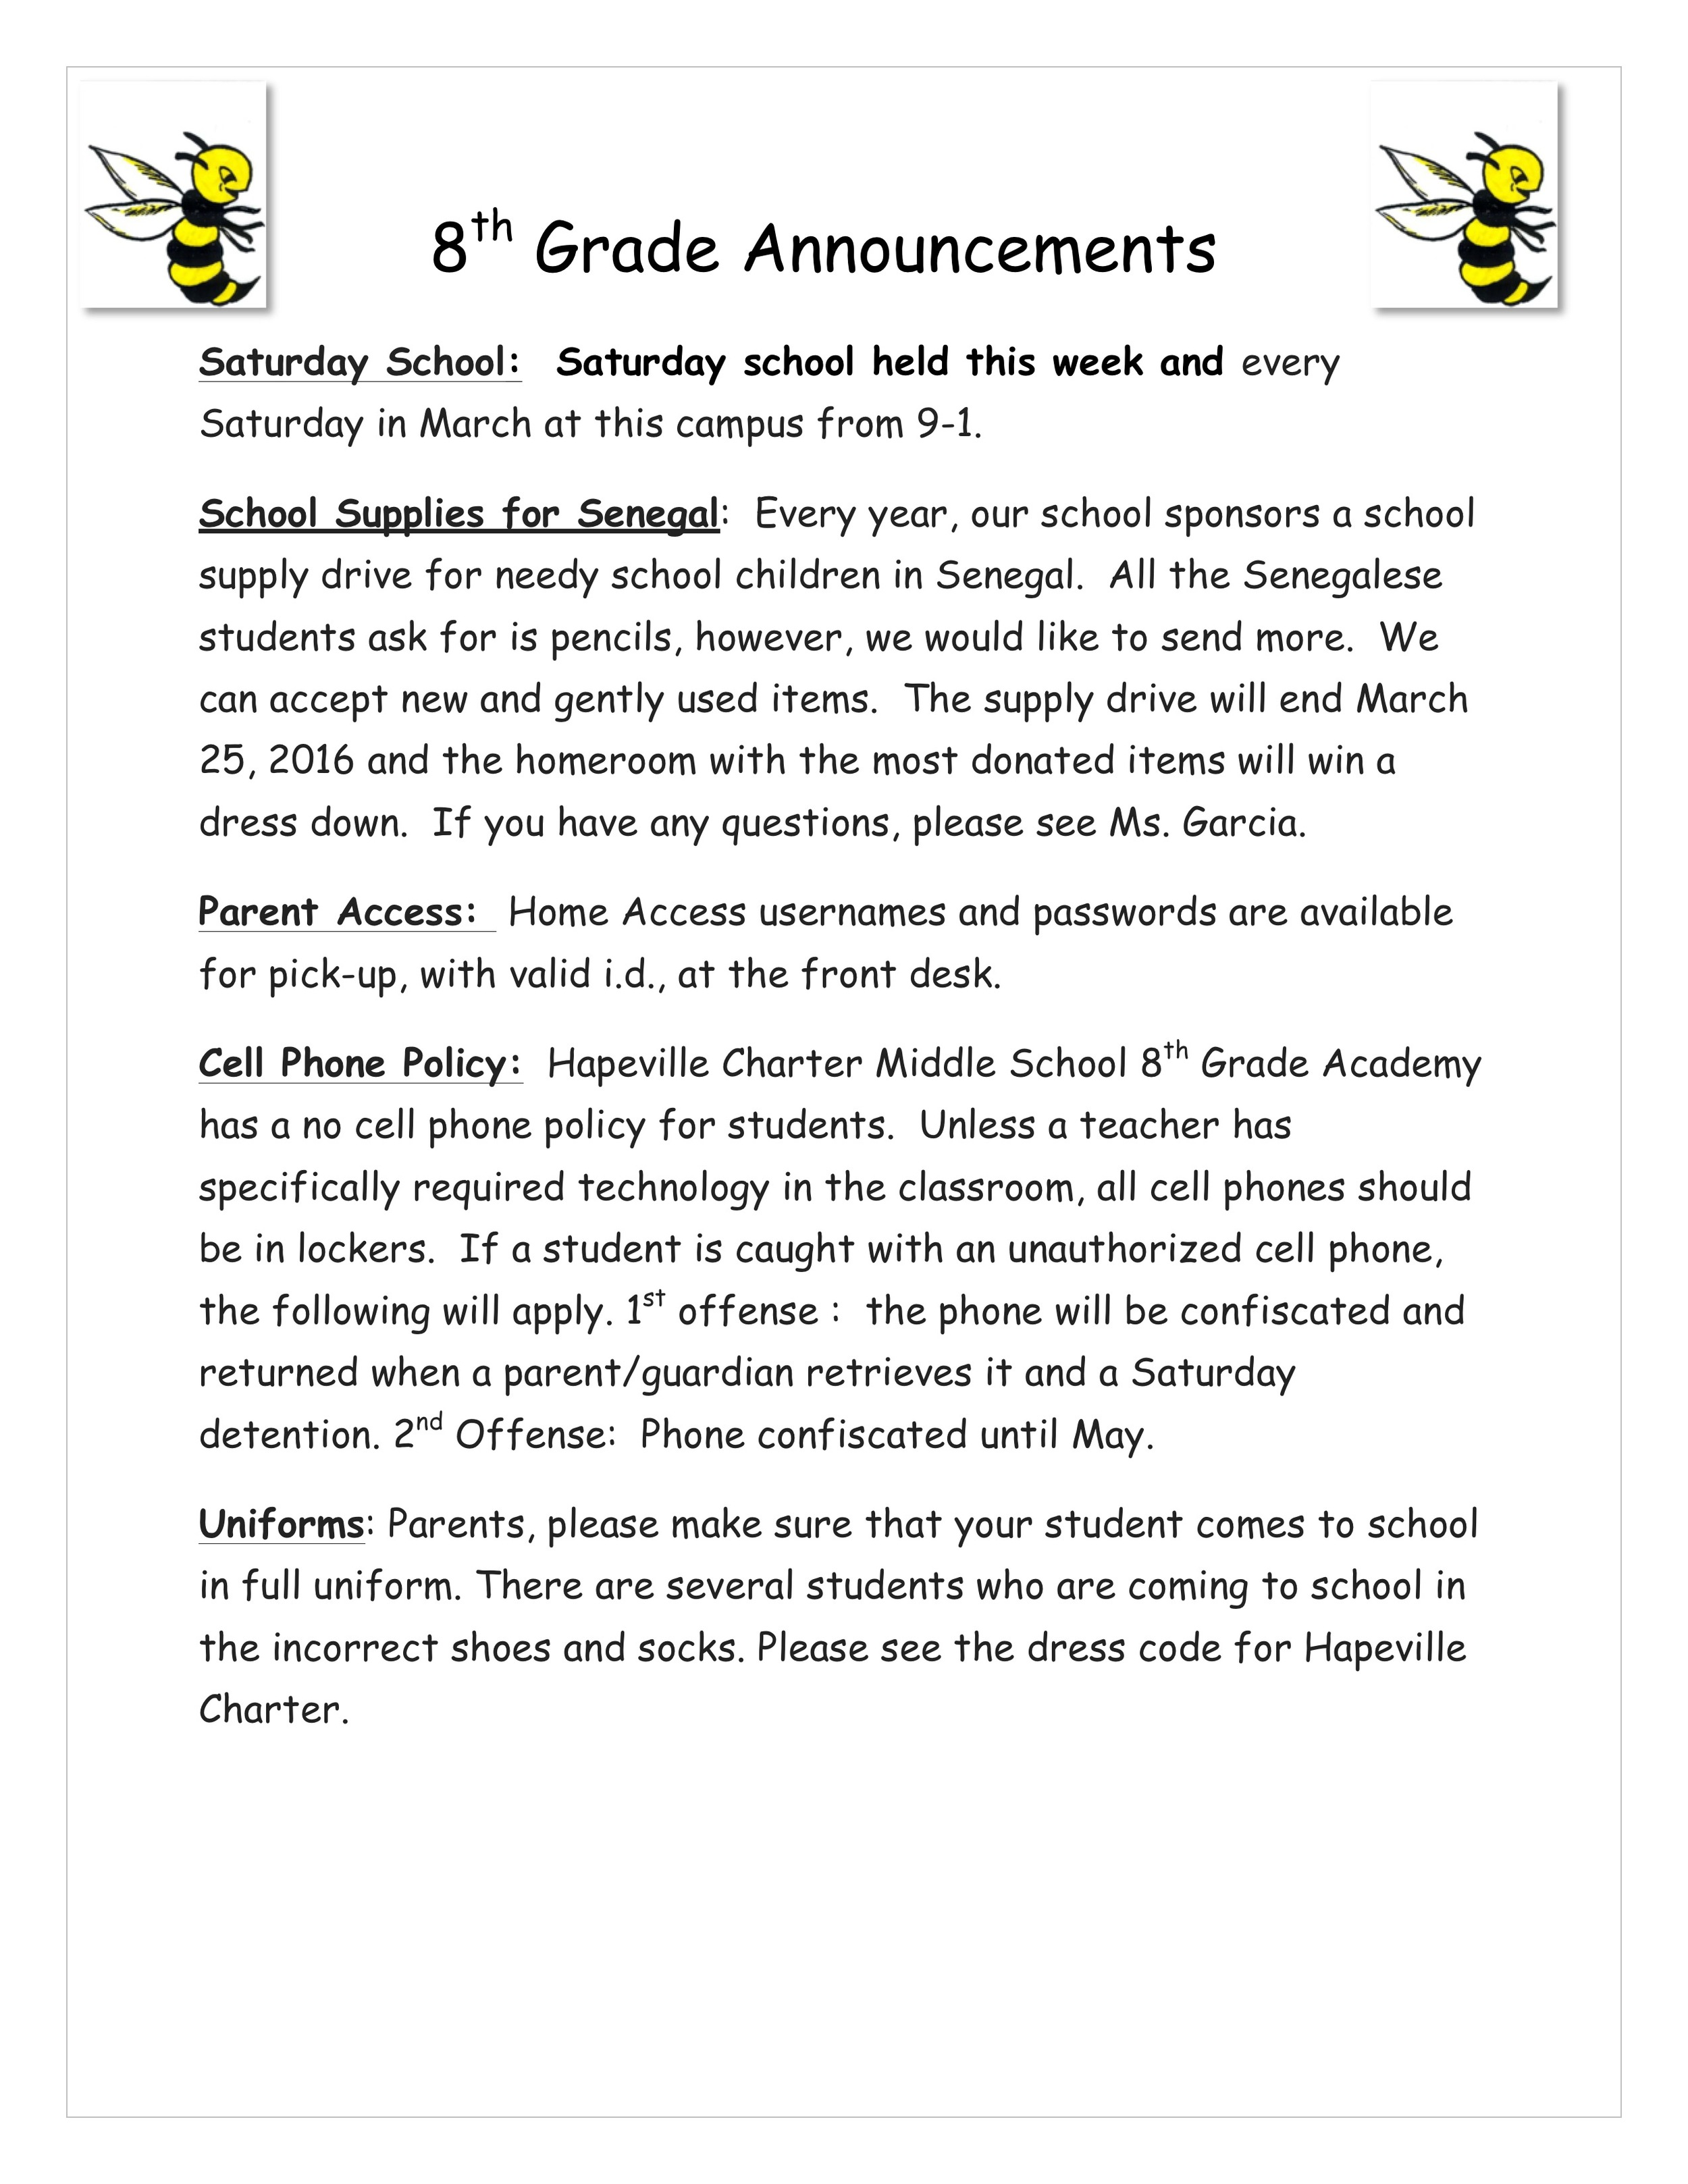 Newsletter Image8th grade 3-14 2.jpeg